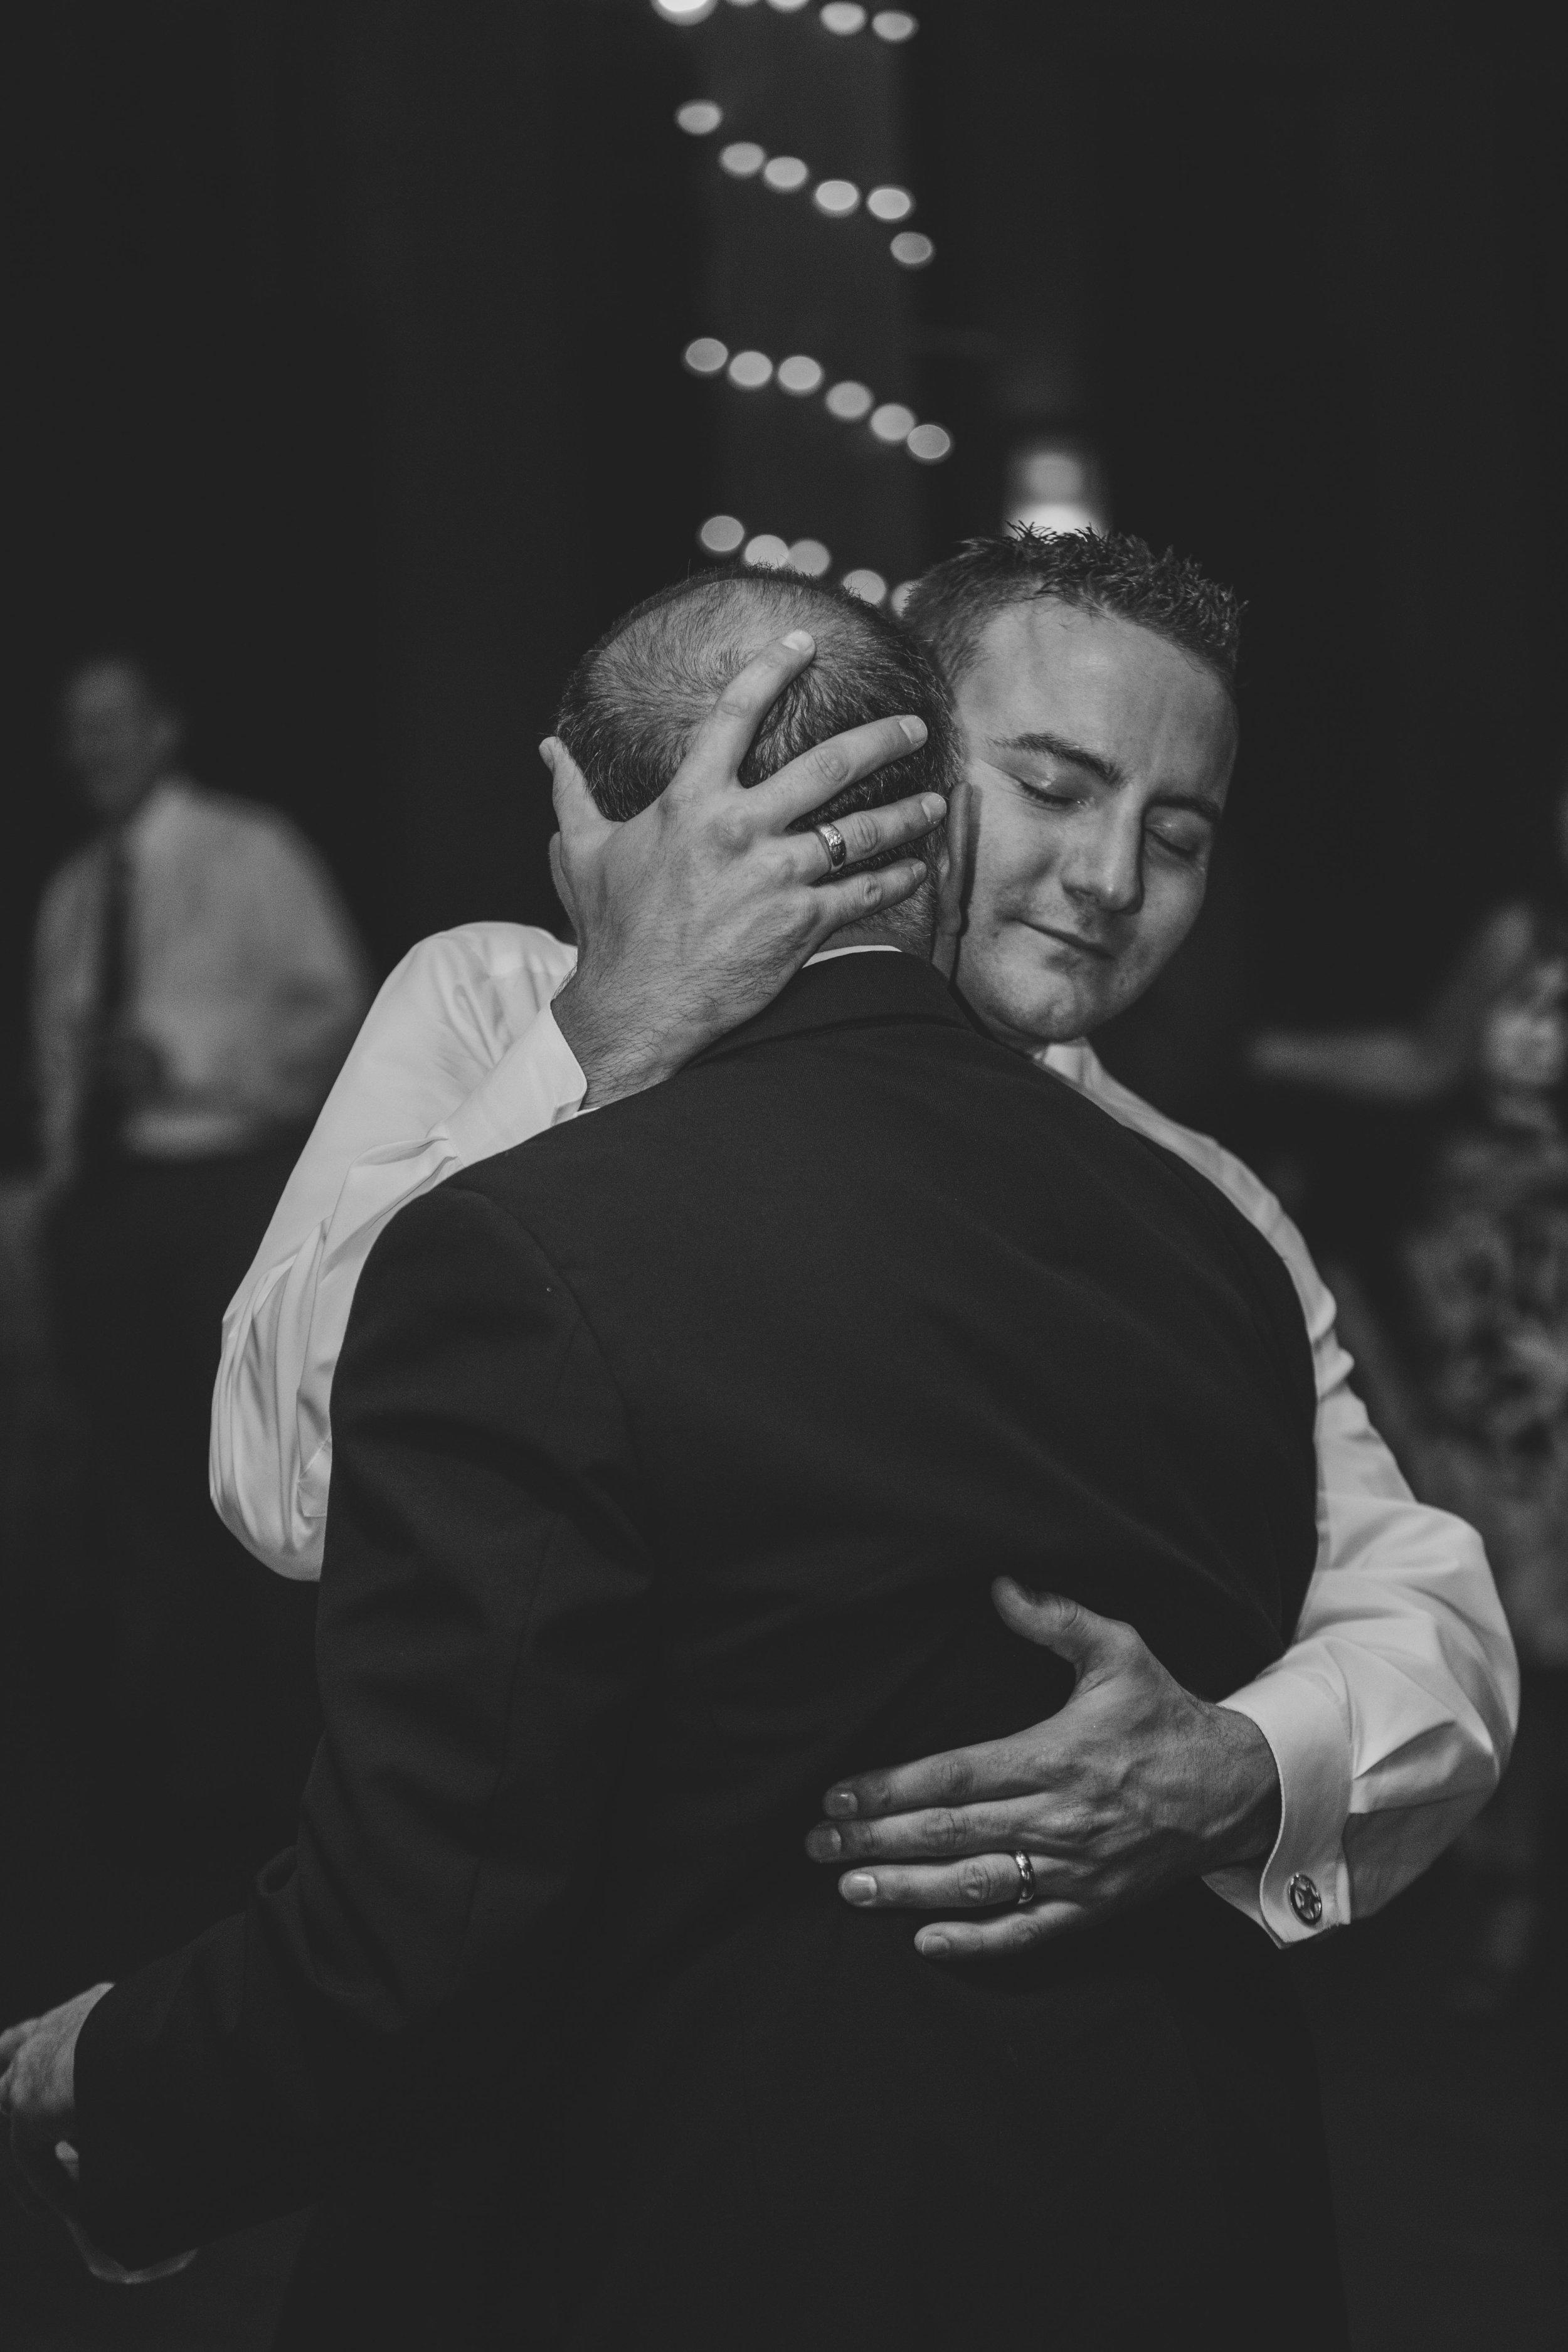 ATGI_Magali & Josh Wedding1_2S8A3030.jpg